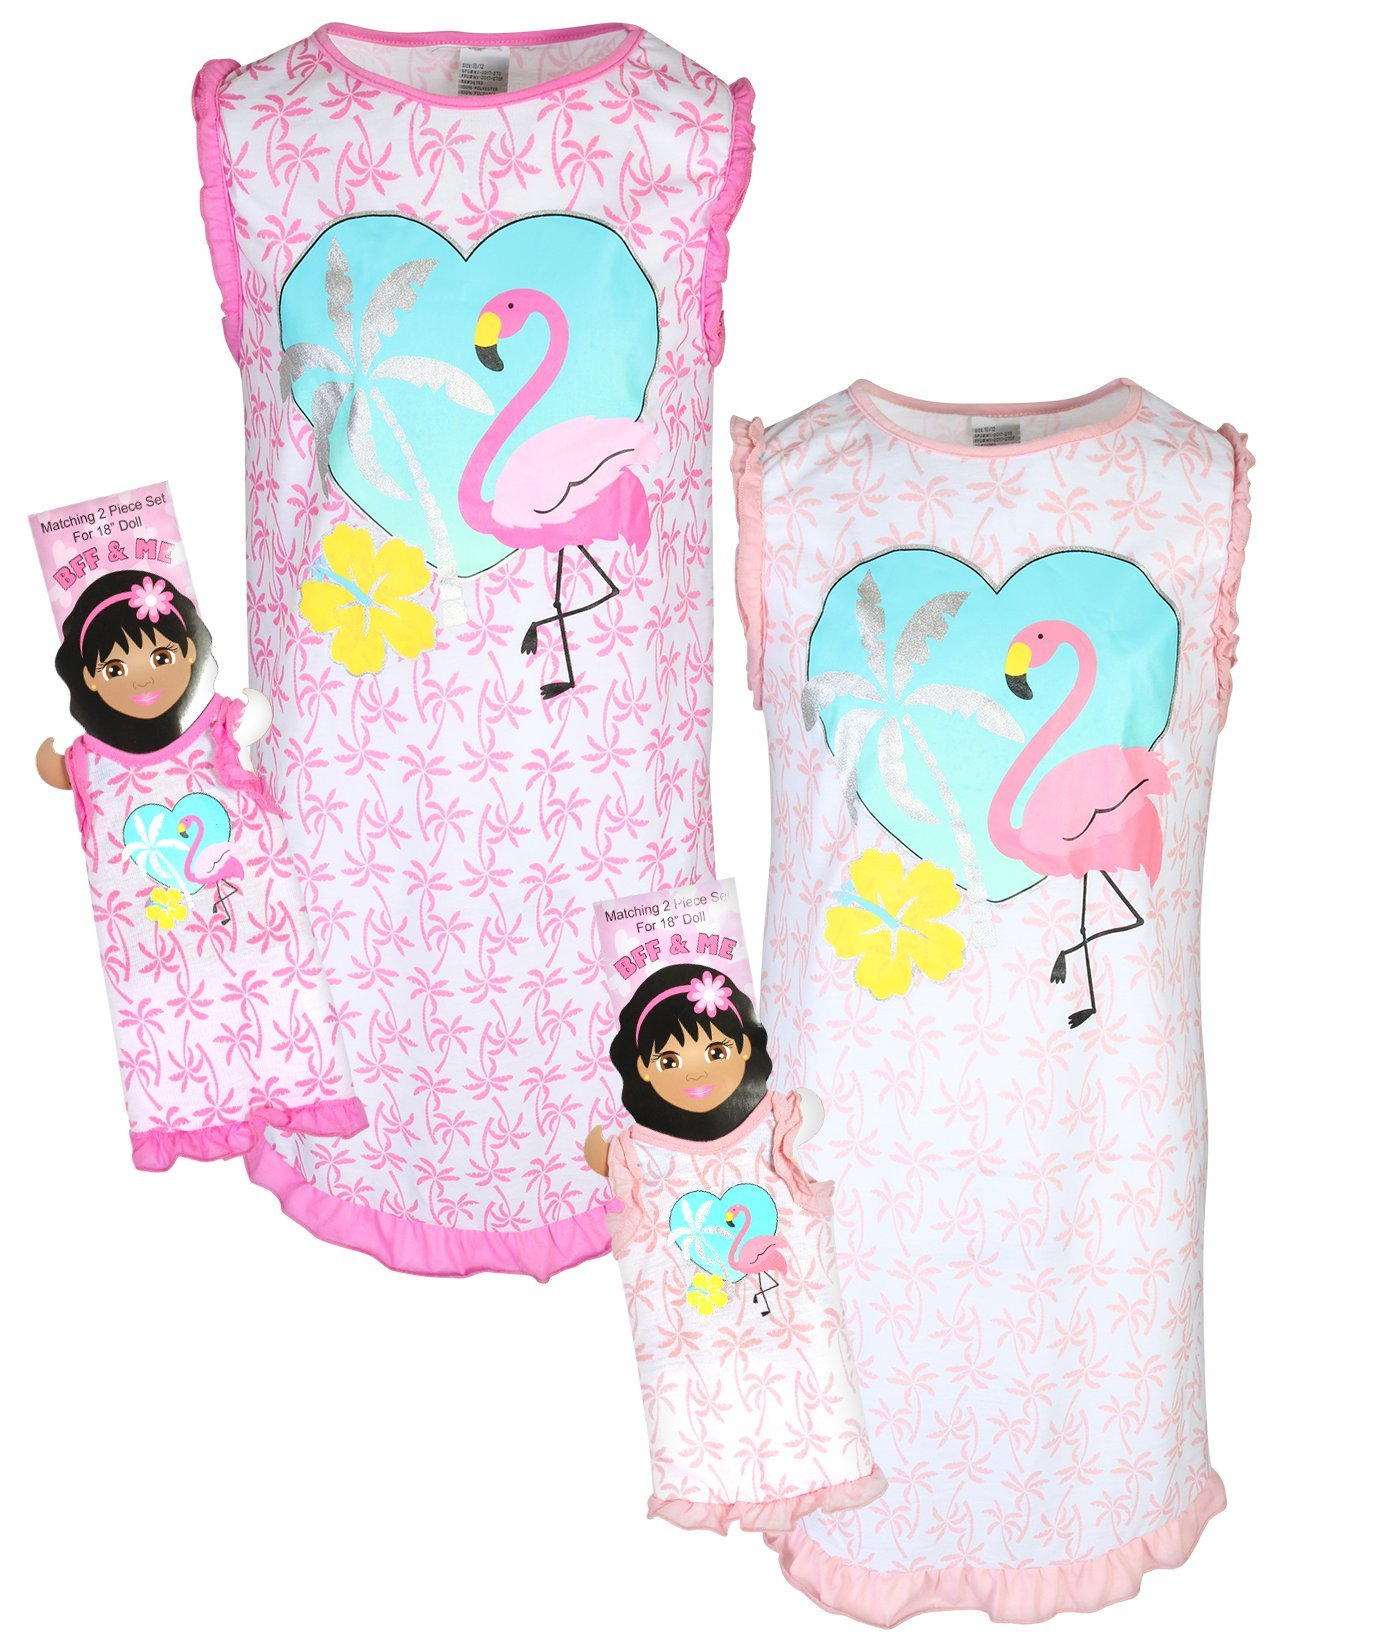 BFF & ME Girls Nightgown Pajama Set with Matching Doll Pajama (2 Pack), Flamingo, Size 7/8'